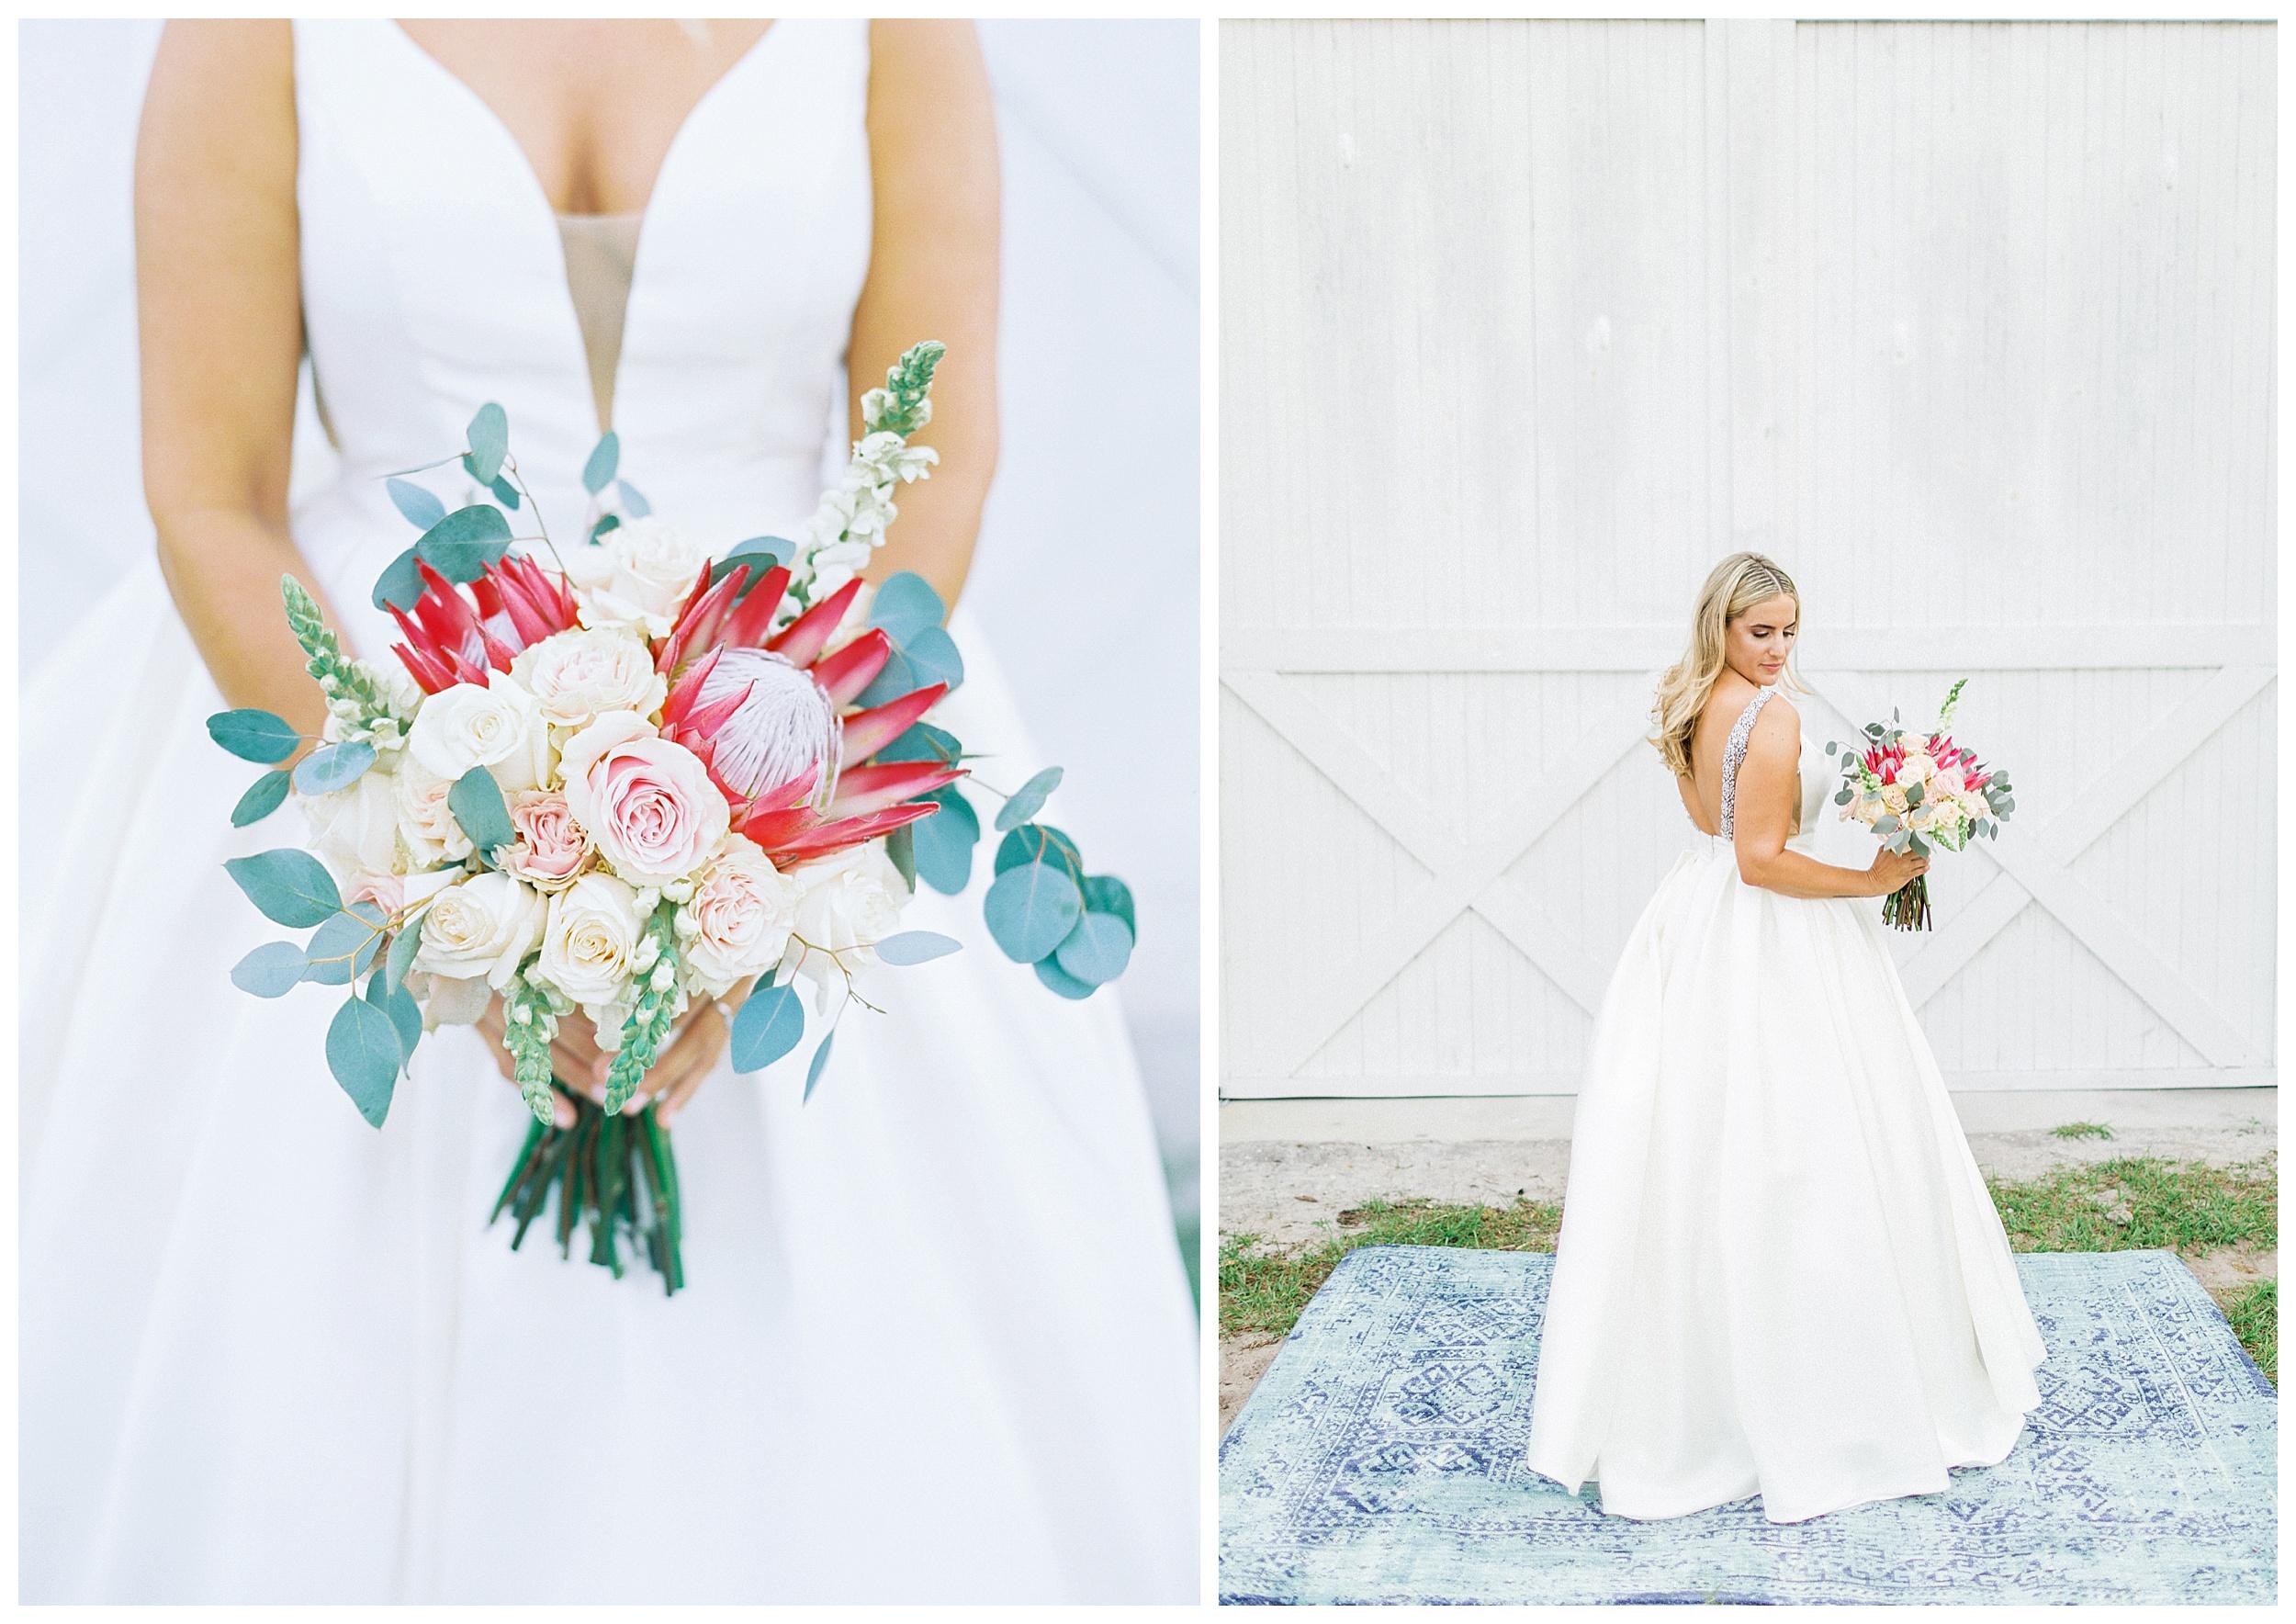 South Florida Wedding Photographer Kir Tuben_0027.jpg